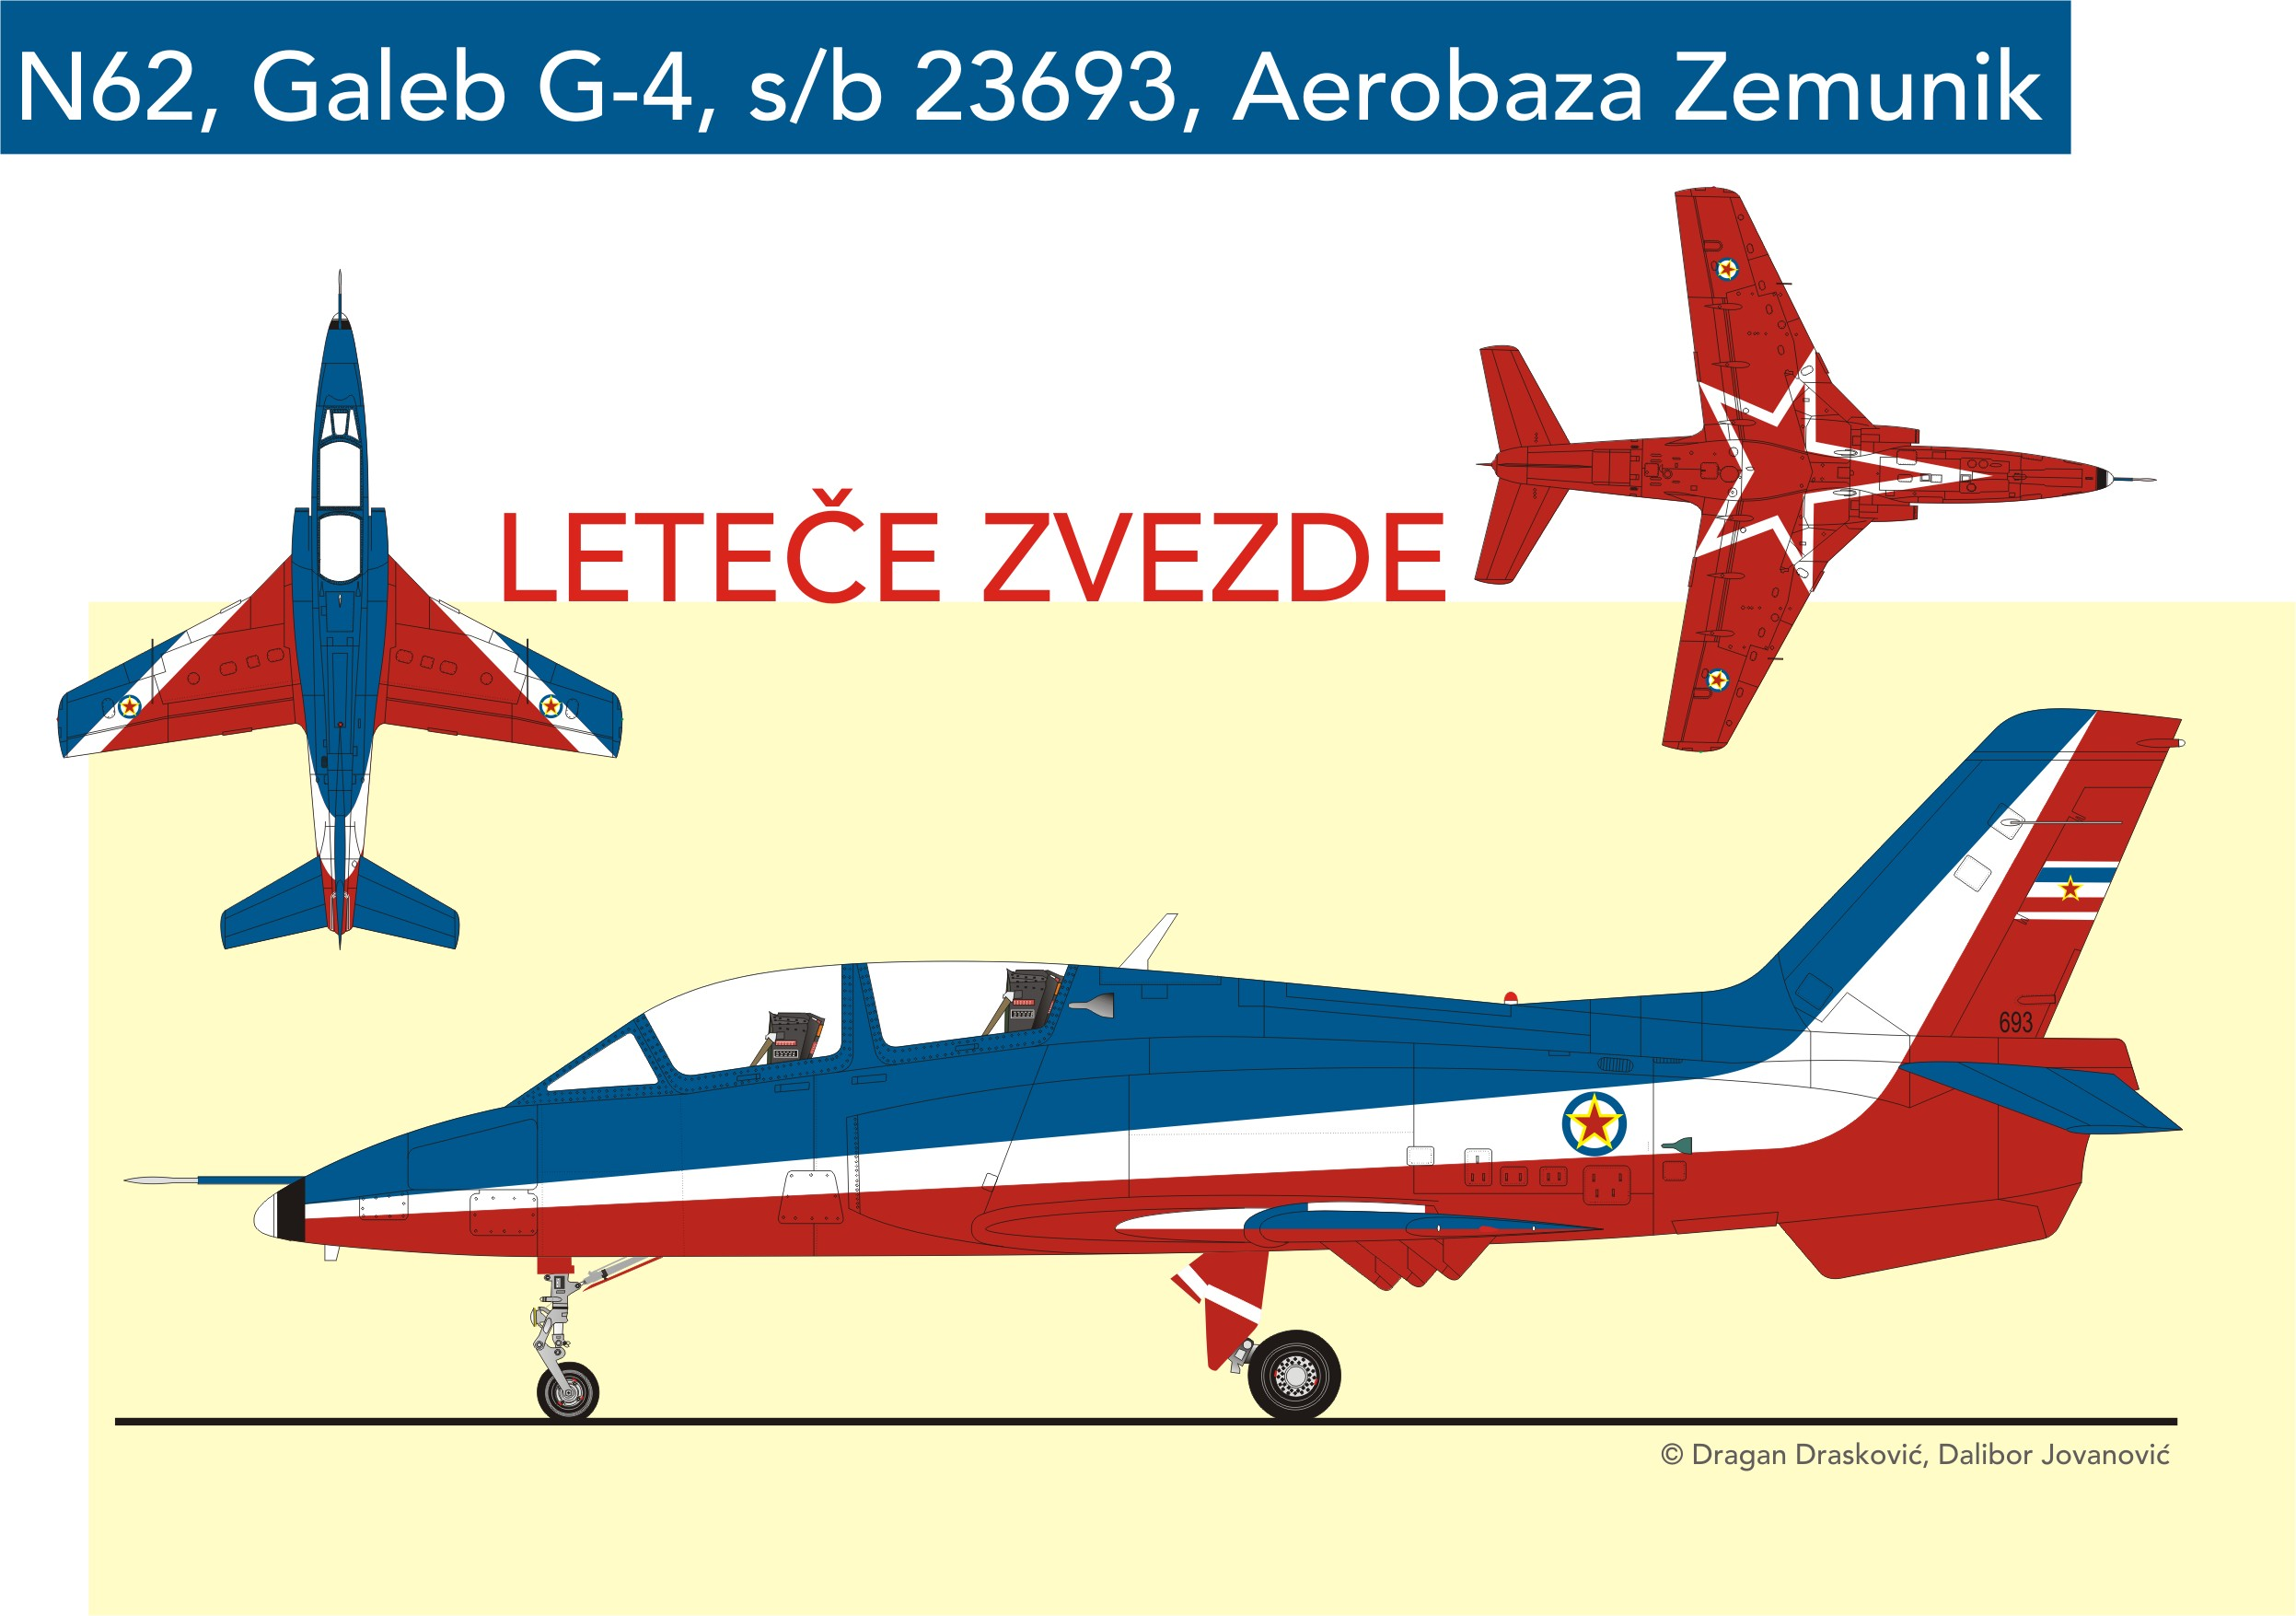 N-62 Soko G-4 Super Galeb 693